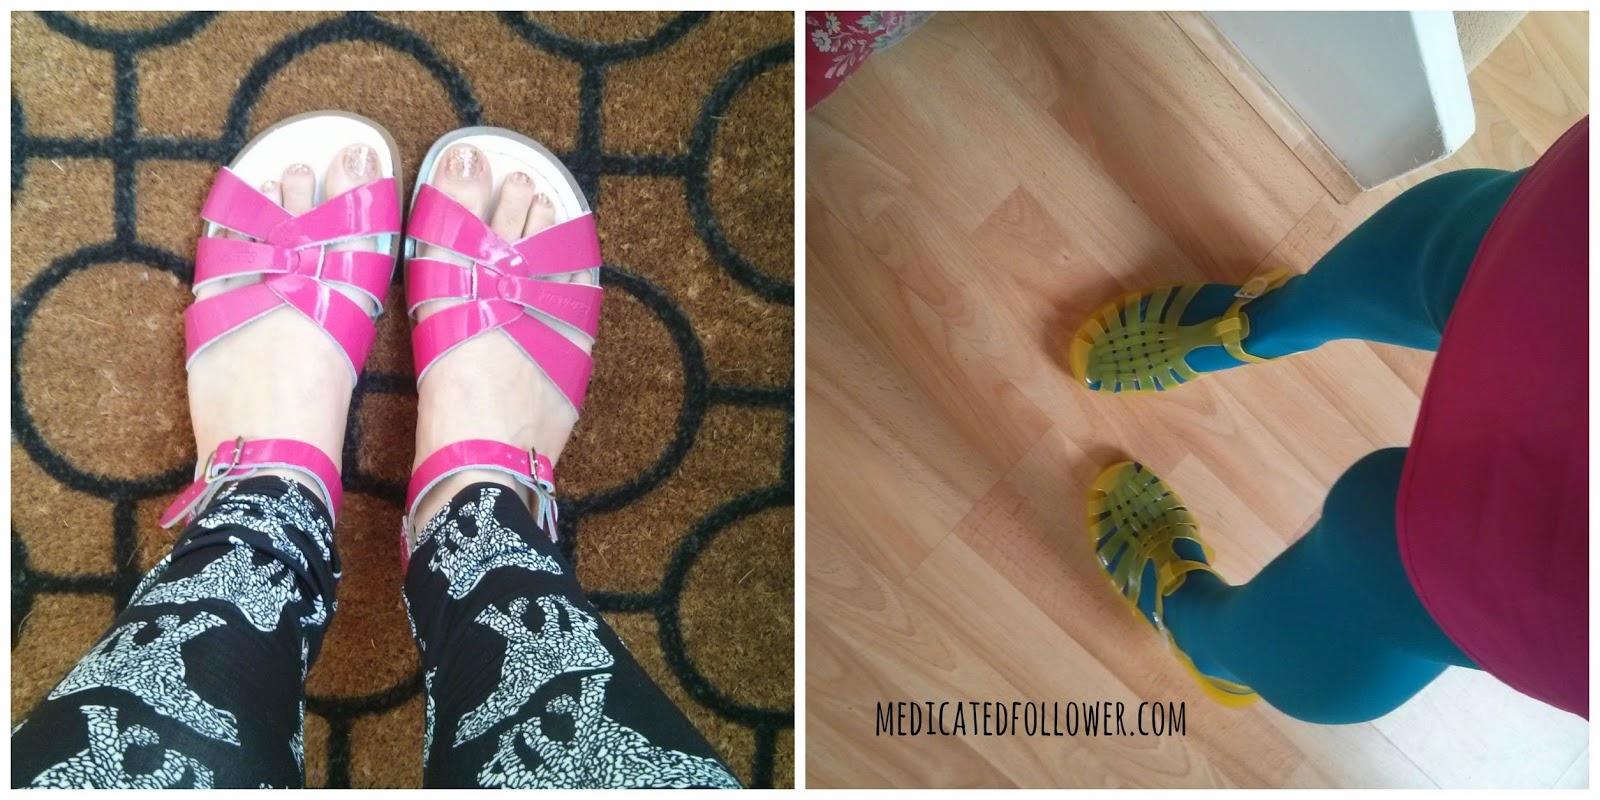 Sunsan Saltwater Sandals Sunjellies